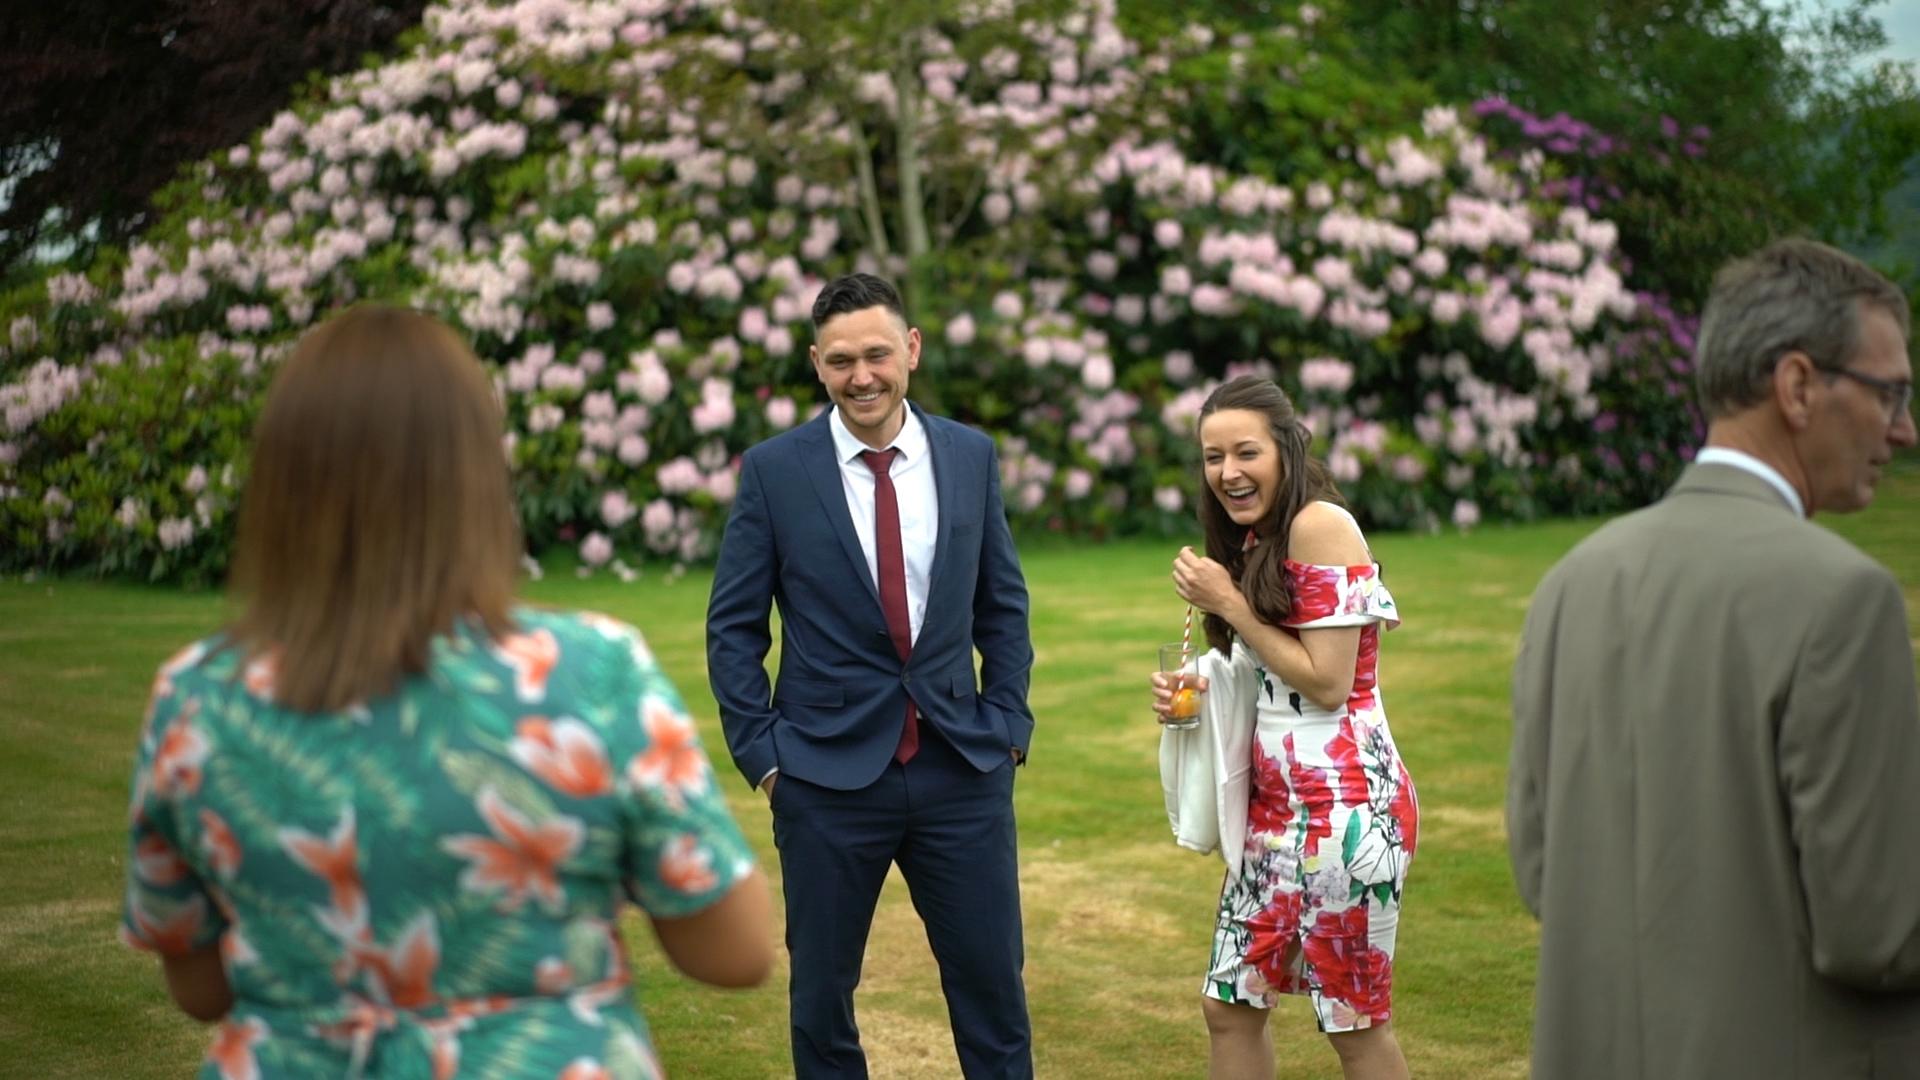 Cornwall Wedding Videography